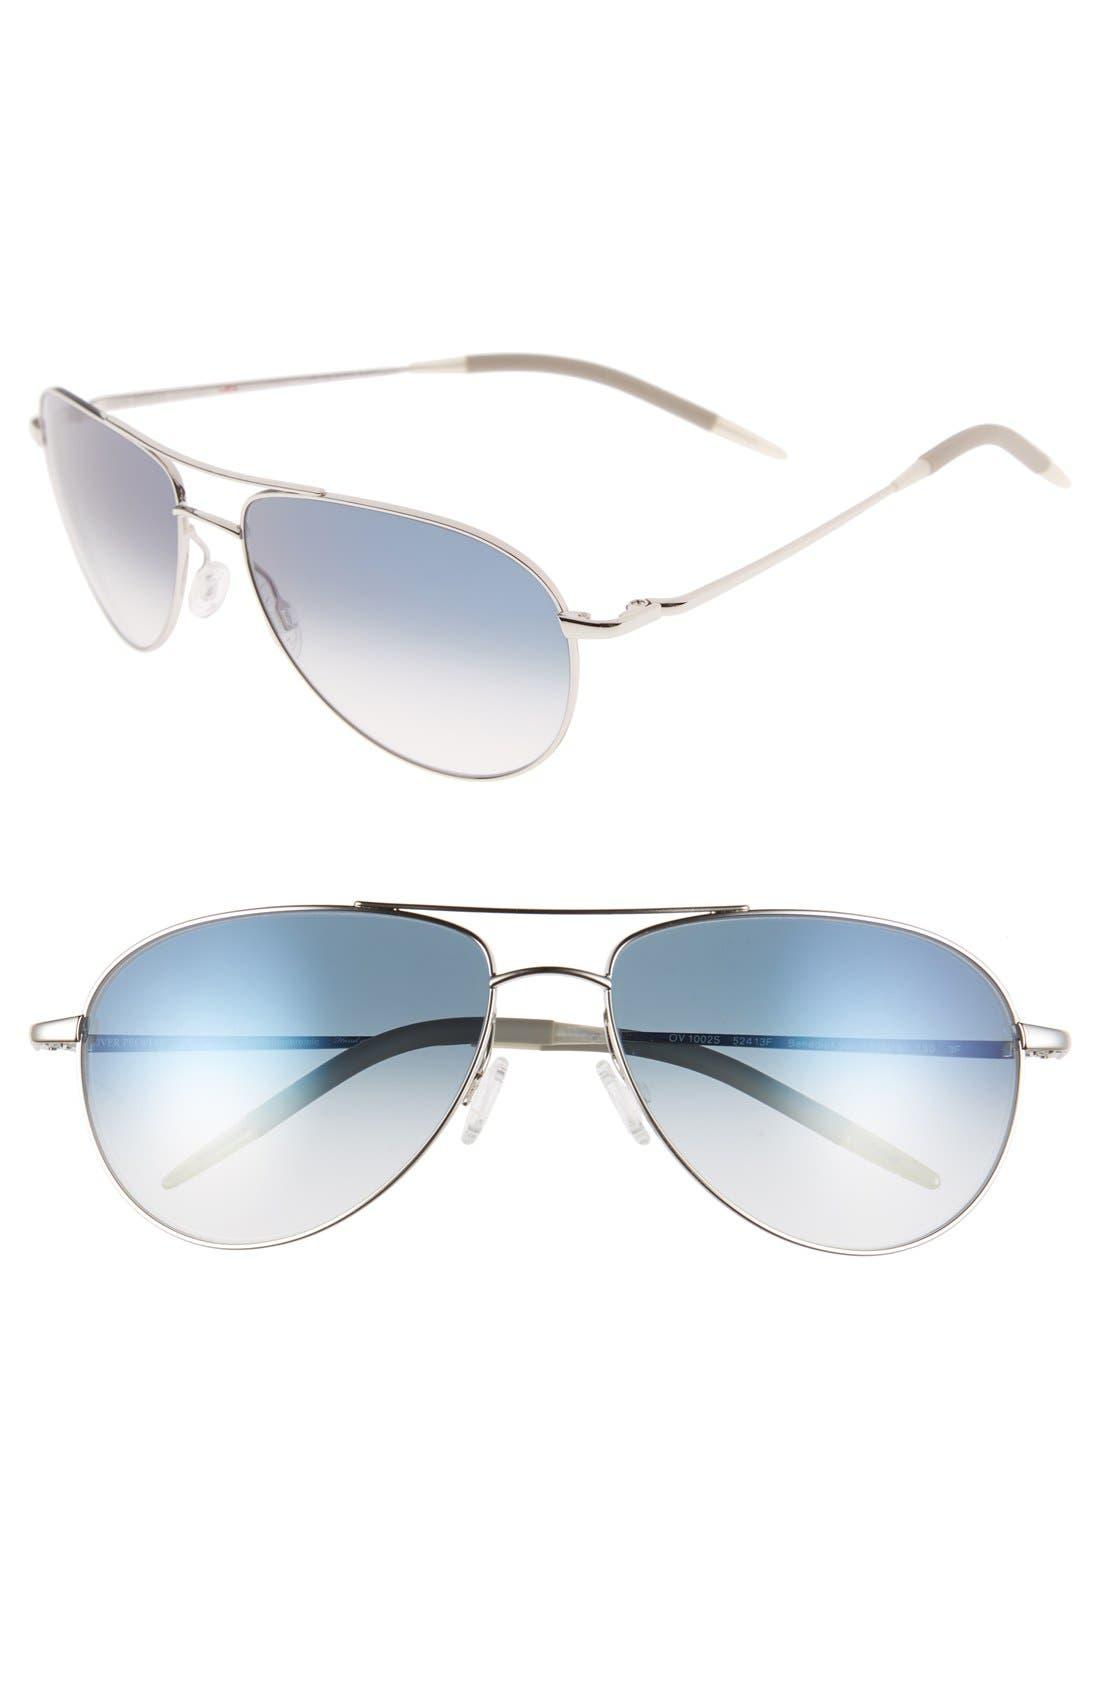 'Benedict' 59mm Gradient Aviator Sunglasses,                             Main thumbnail 1, color,                             Silver/ Chrome Sapphire